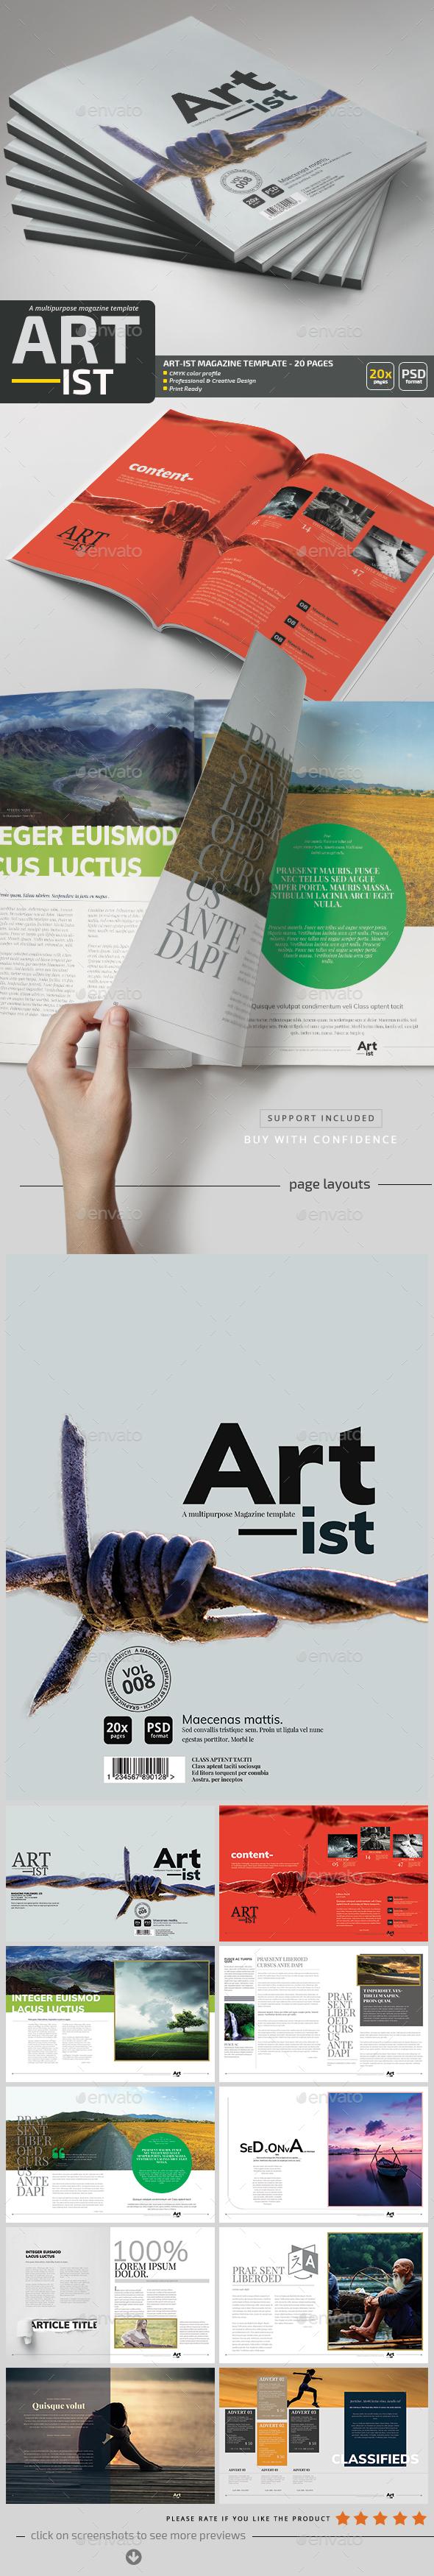 Art-ist Magazine Template V.8 - Magazines Print Templates